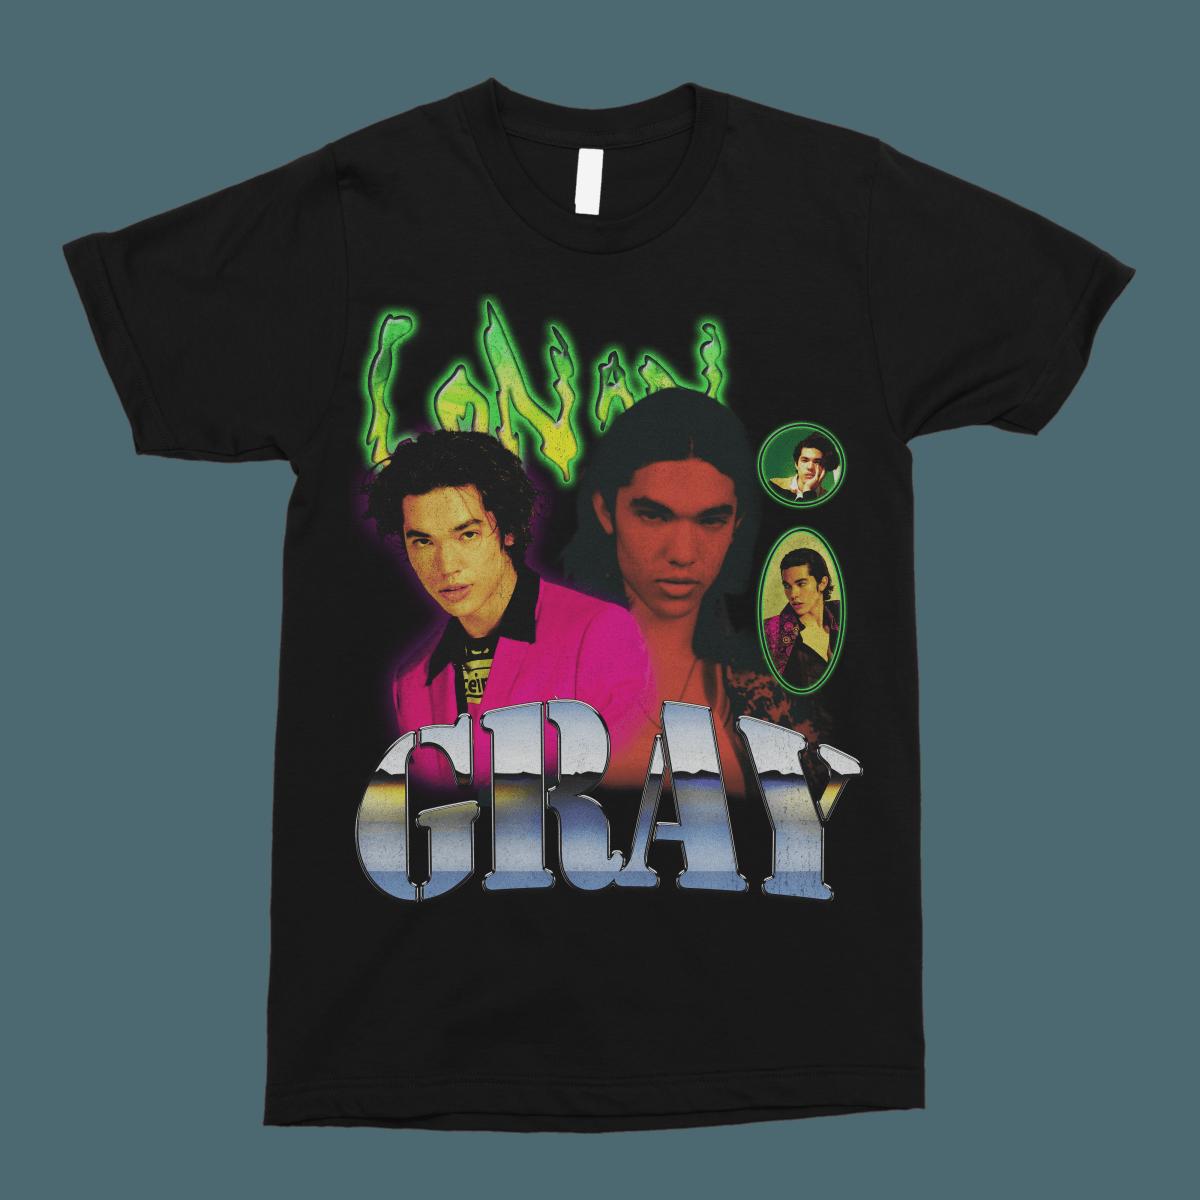 Conan Gray Vintage Bootleg Unisex T-Shirt